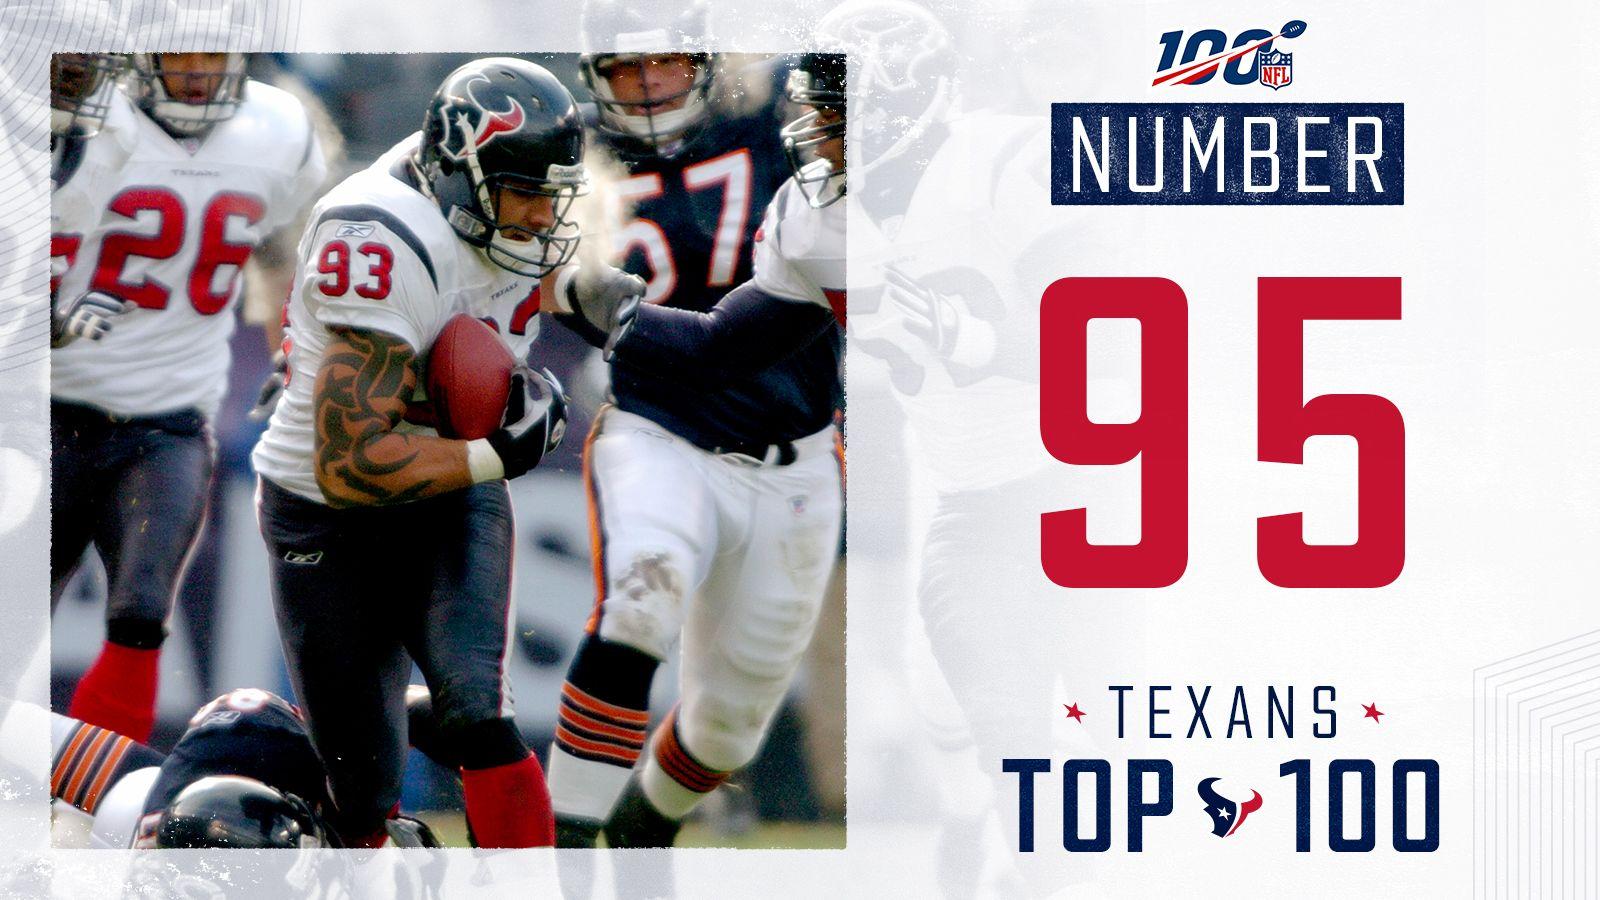 95_Texans beat Bears in 2004 - TWITTER